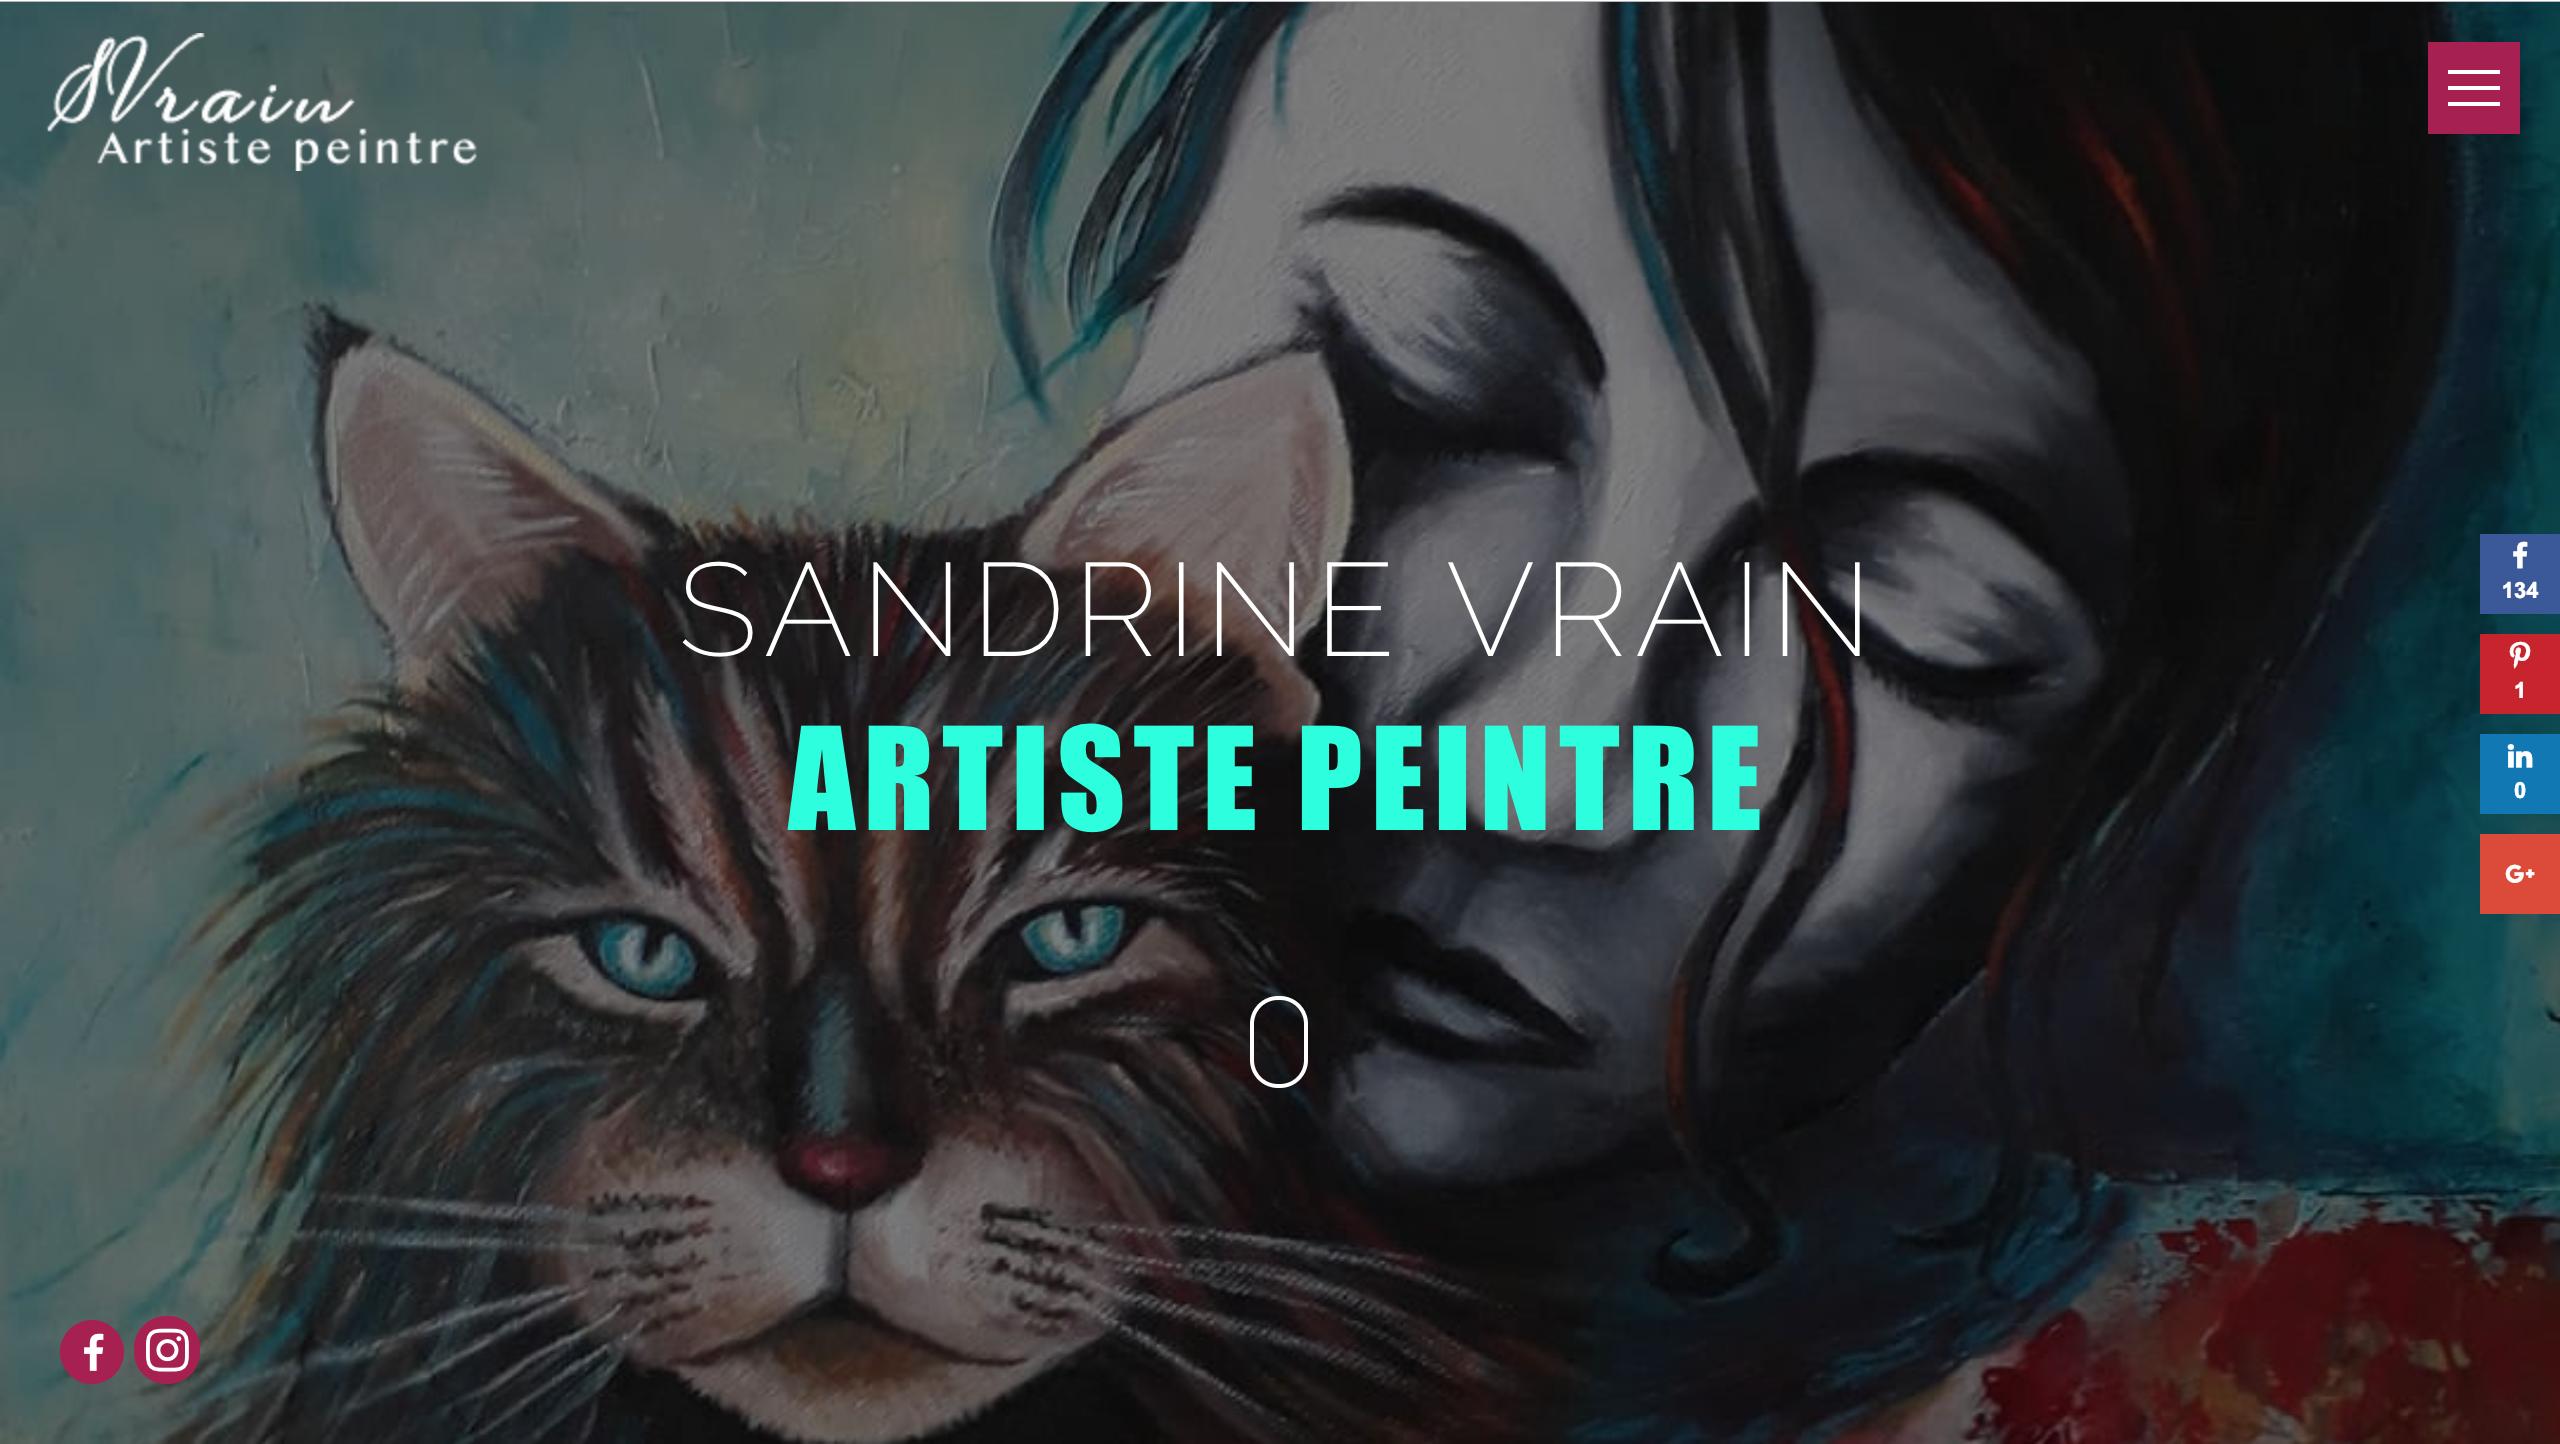 Site Des Artistes Peintres svrain - artiste peintre - franck piazza - chrysalid.eu